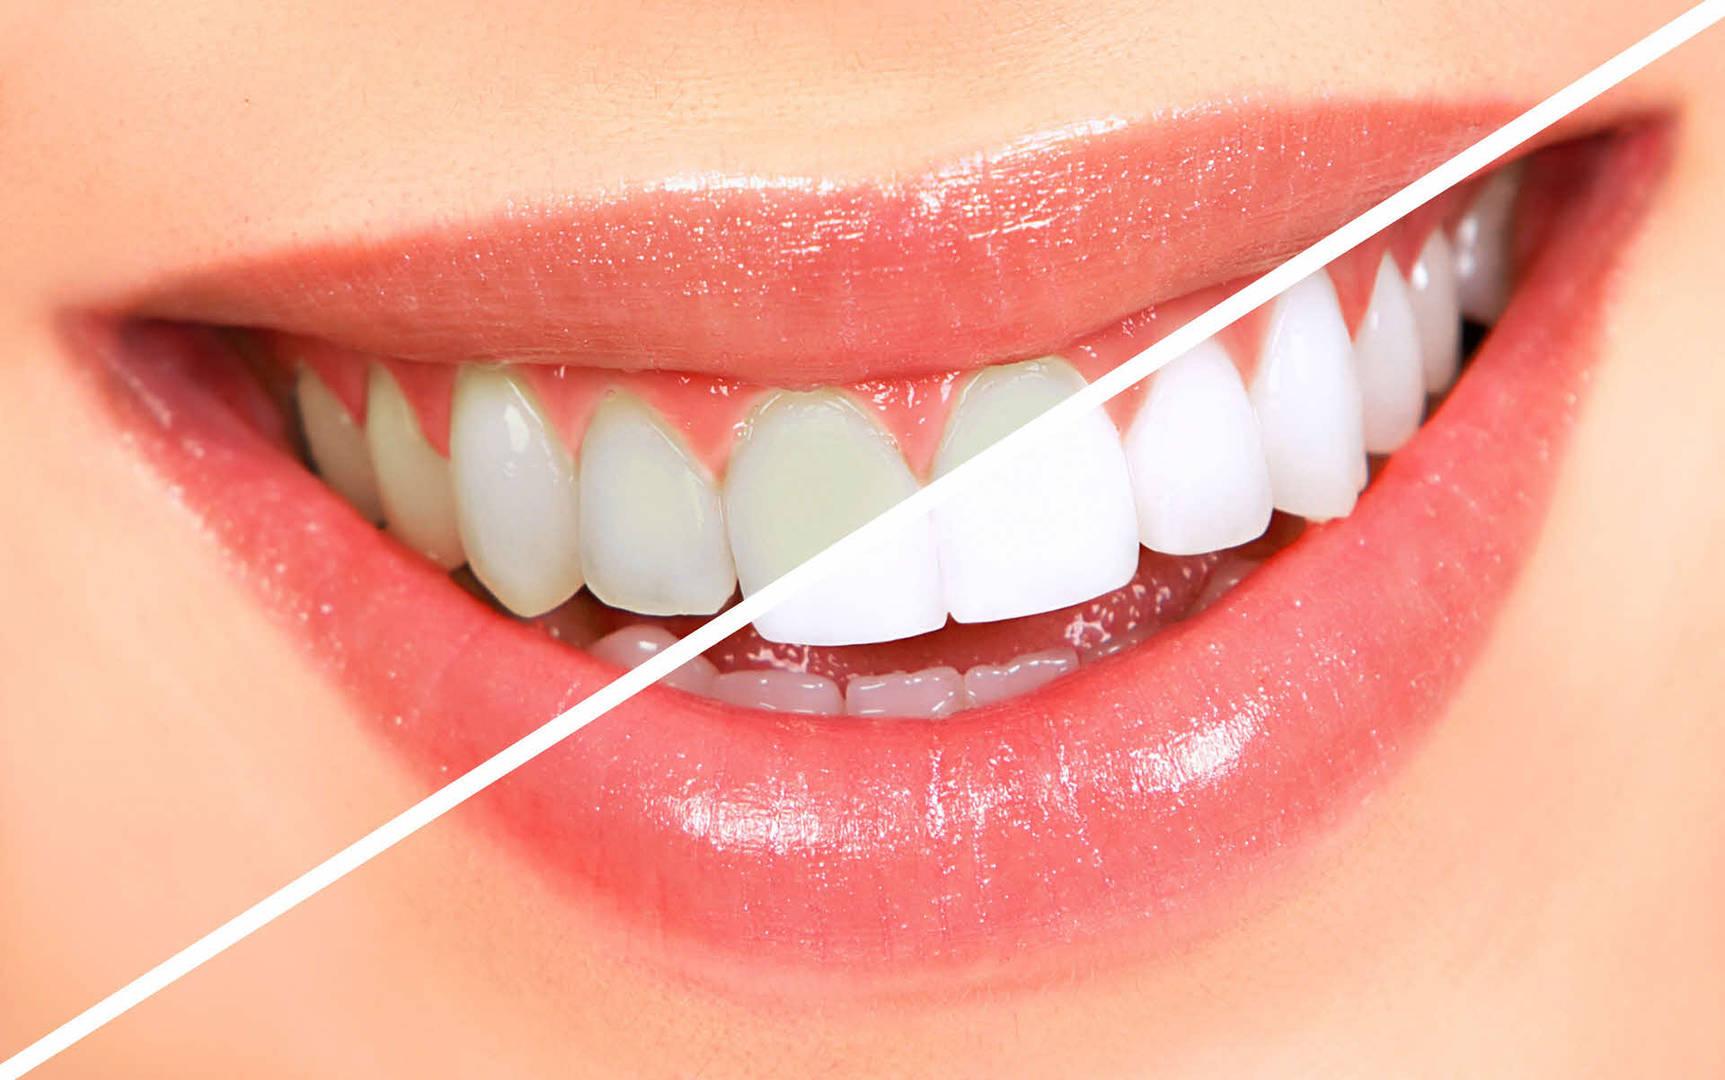 clareamento-dental (2).jpg